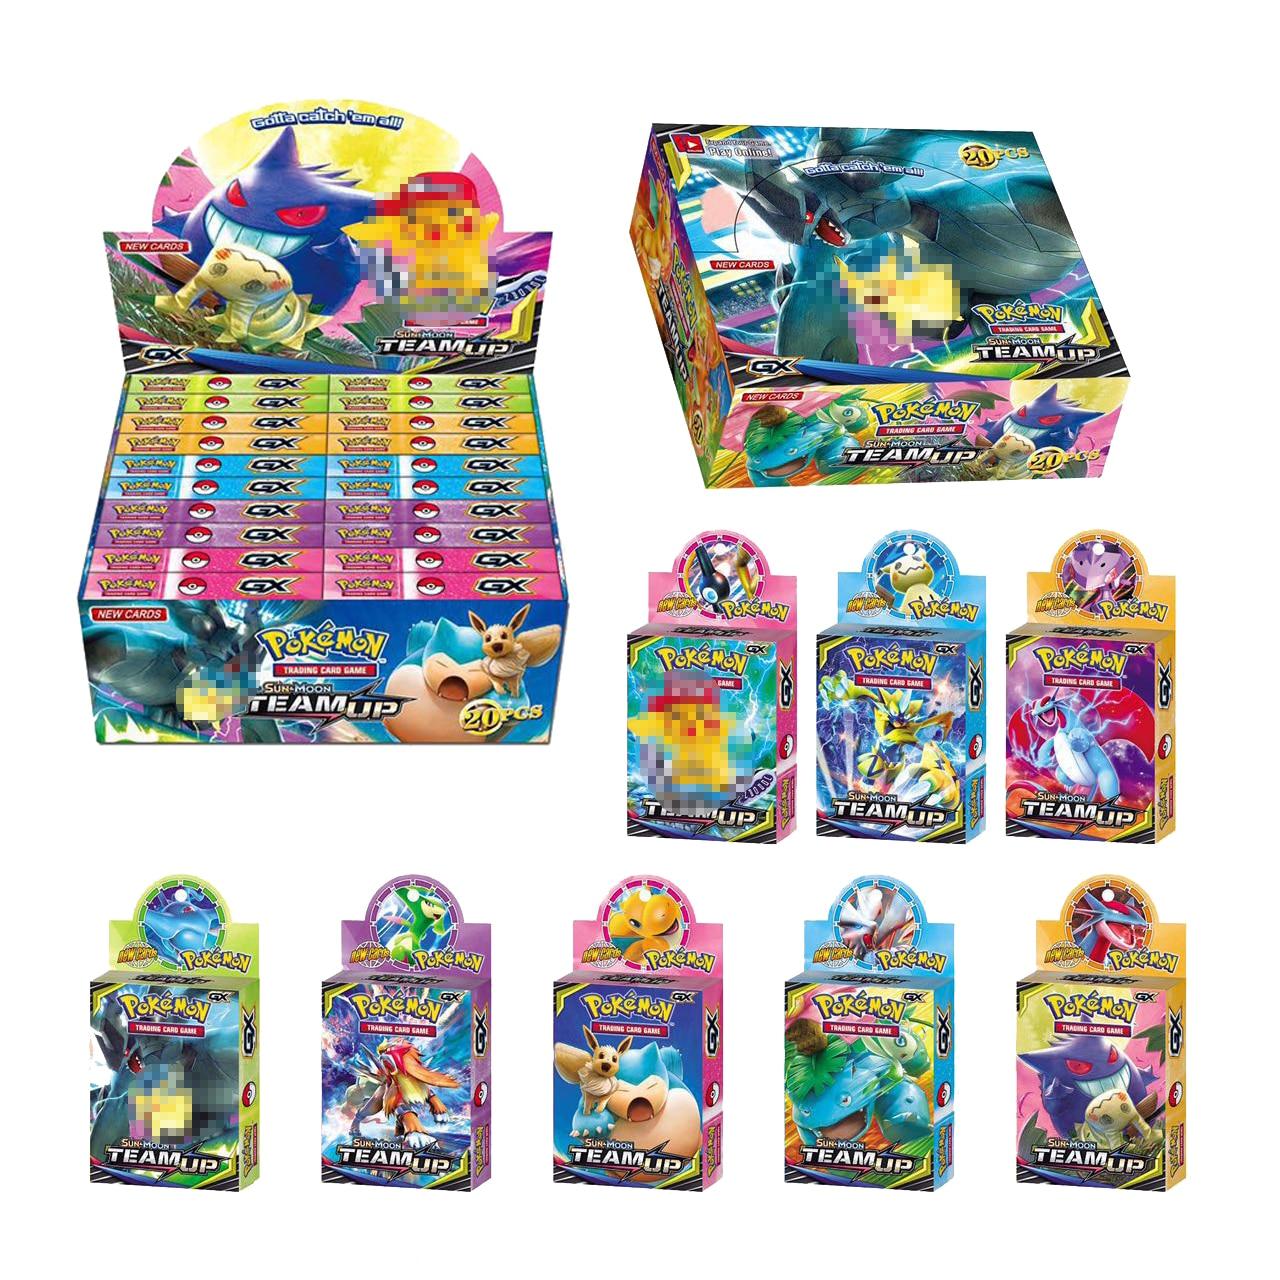 TAKARA TOMY Pokemon 33PCS GX EX MEGA Cover Flash Card 3D Version SWORD SHIELD SUN&MOON Card Collectible Gift Kids Toy